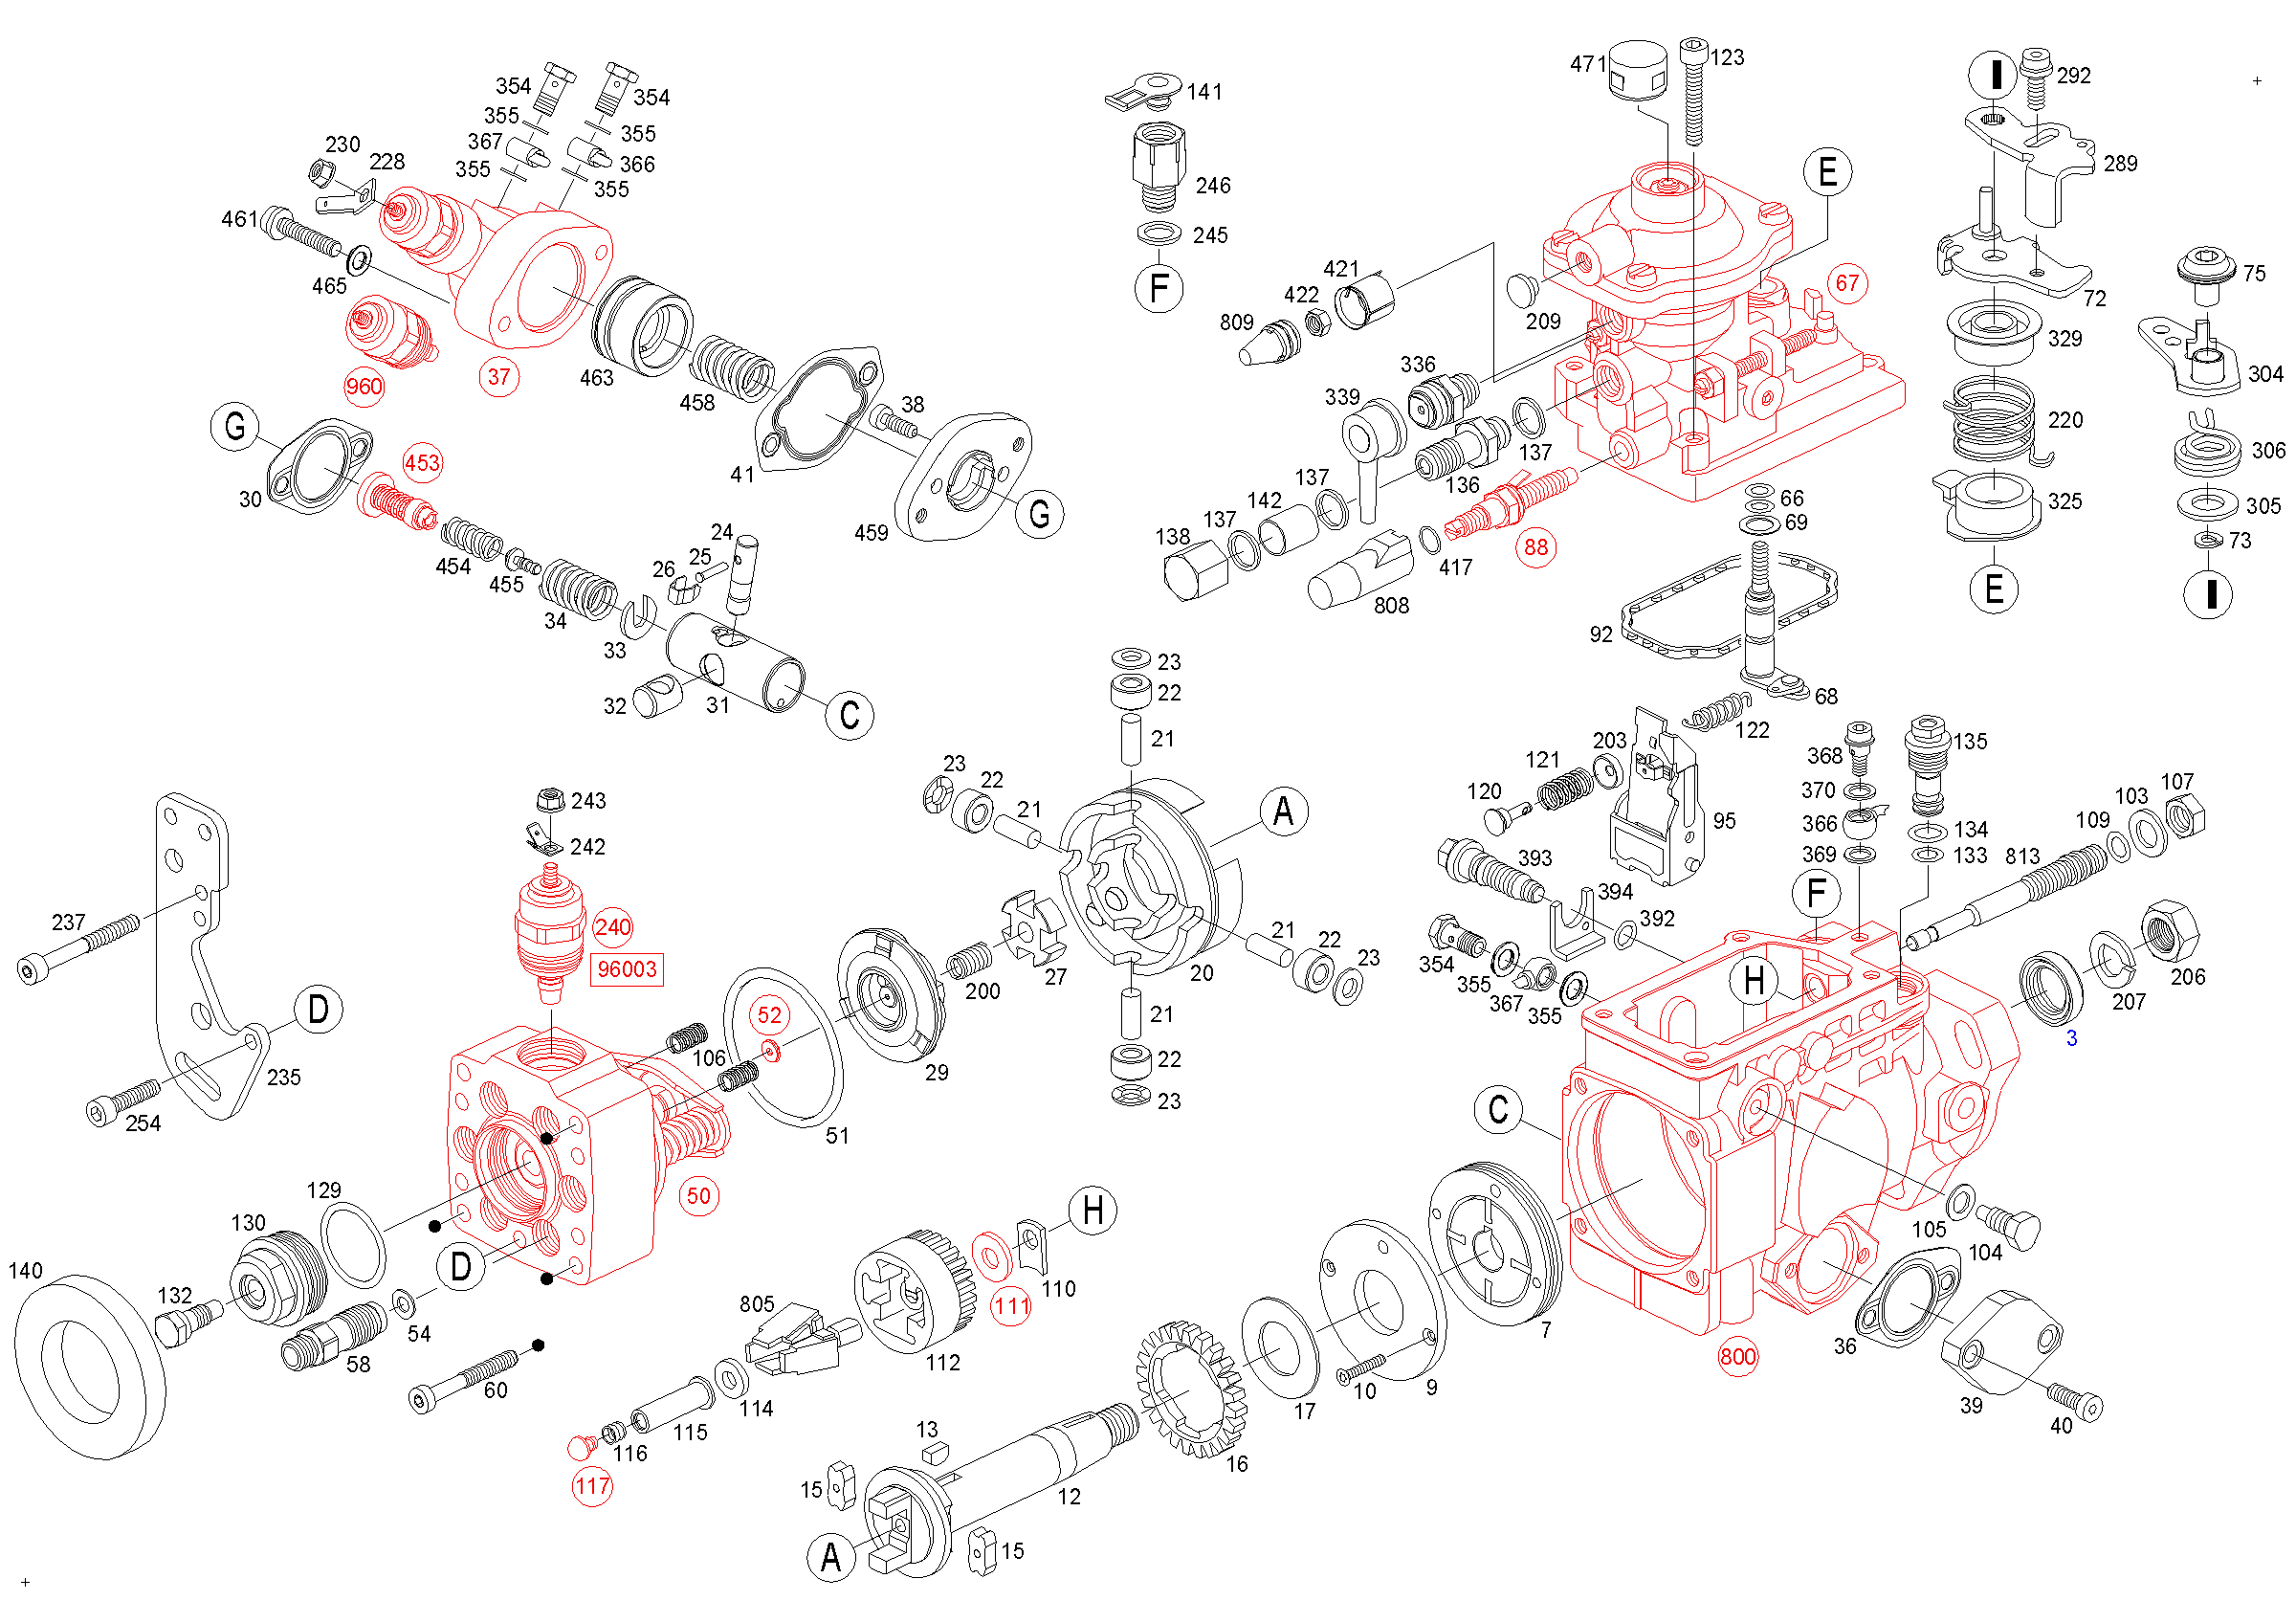 0 460 426 369, Fuel distributor injection pump BOSCH VE series, 0460426369